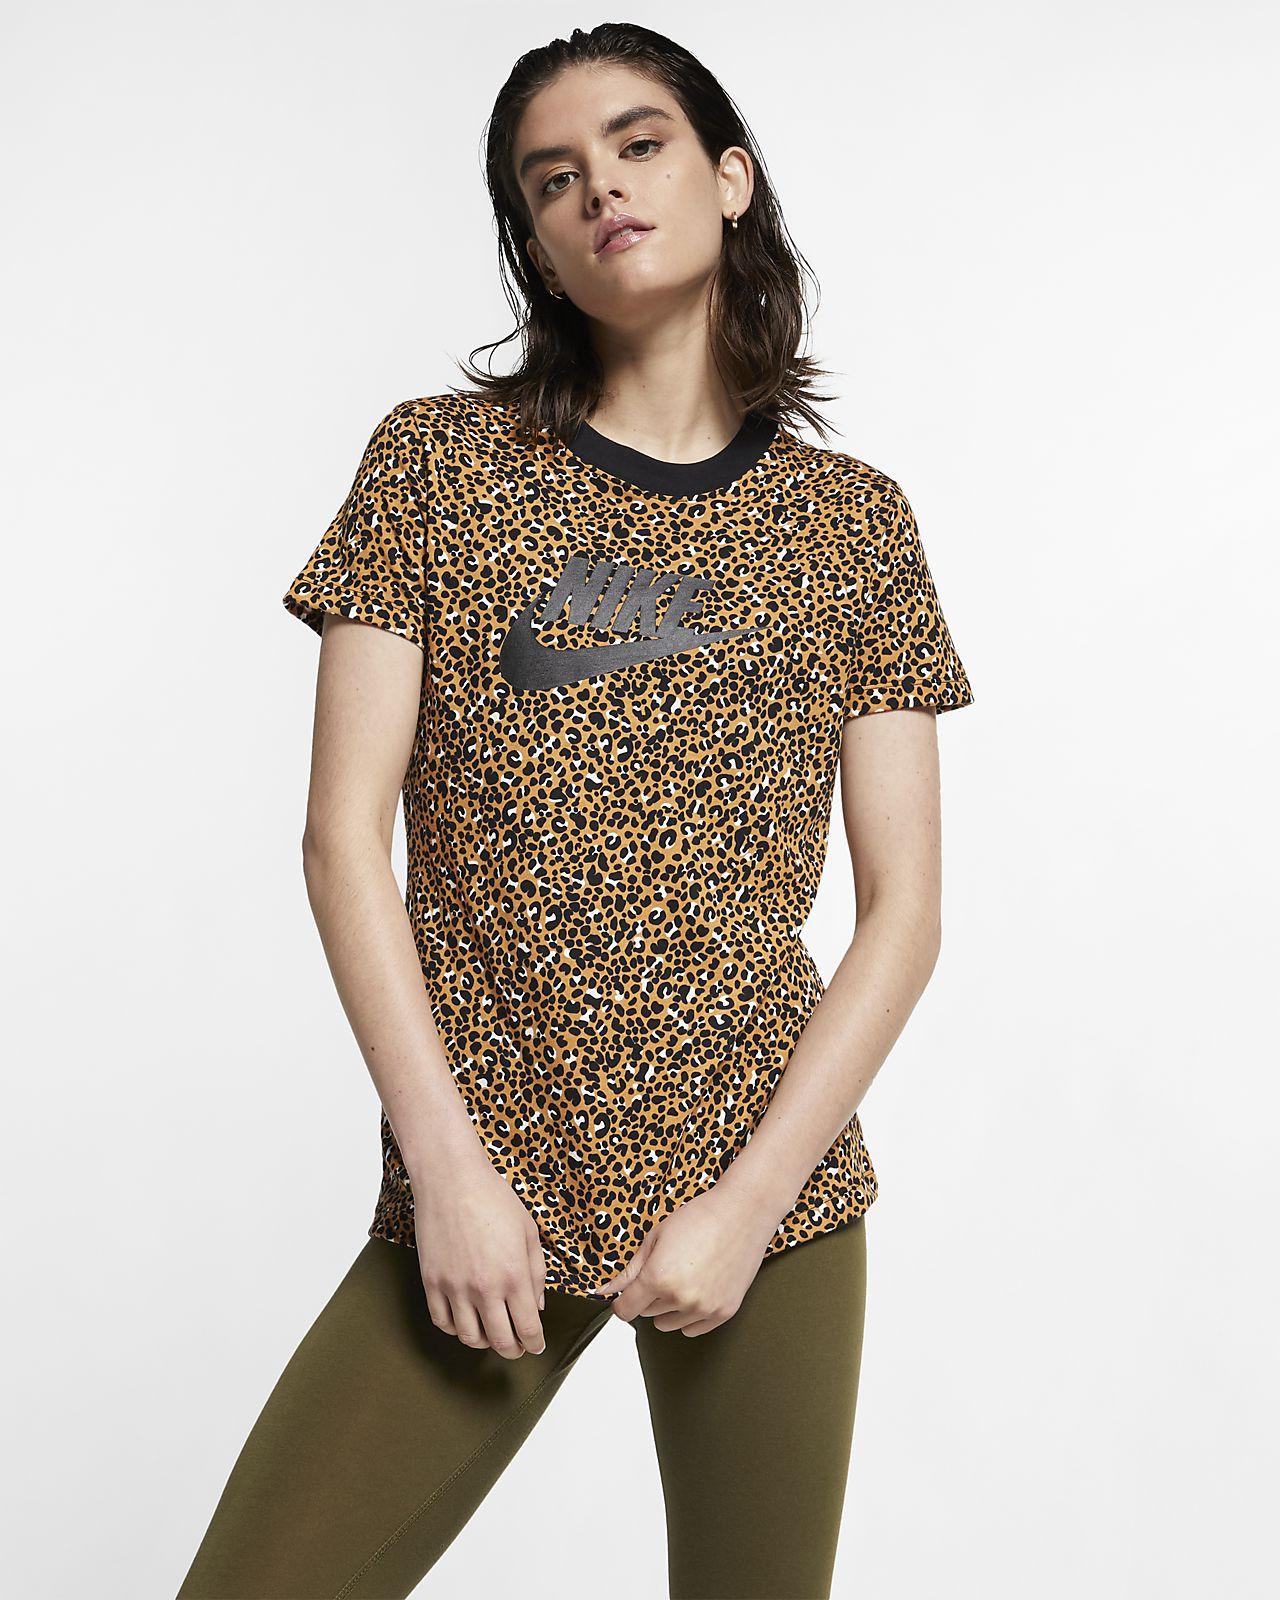 Nike Sportswear Animal Print Camiseta - Mujer